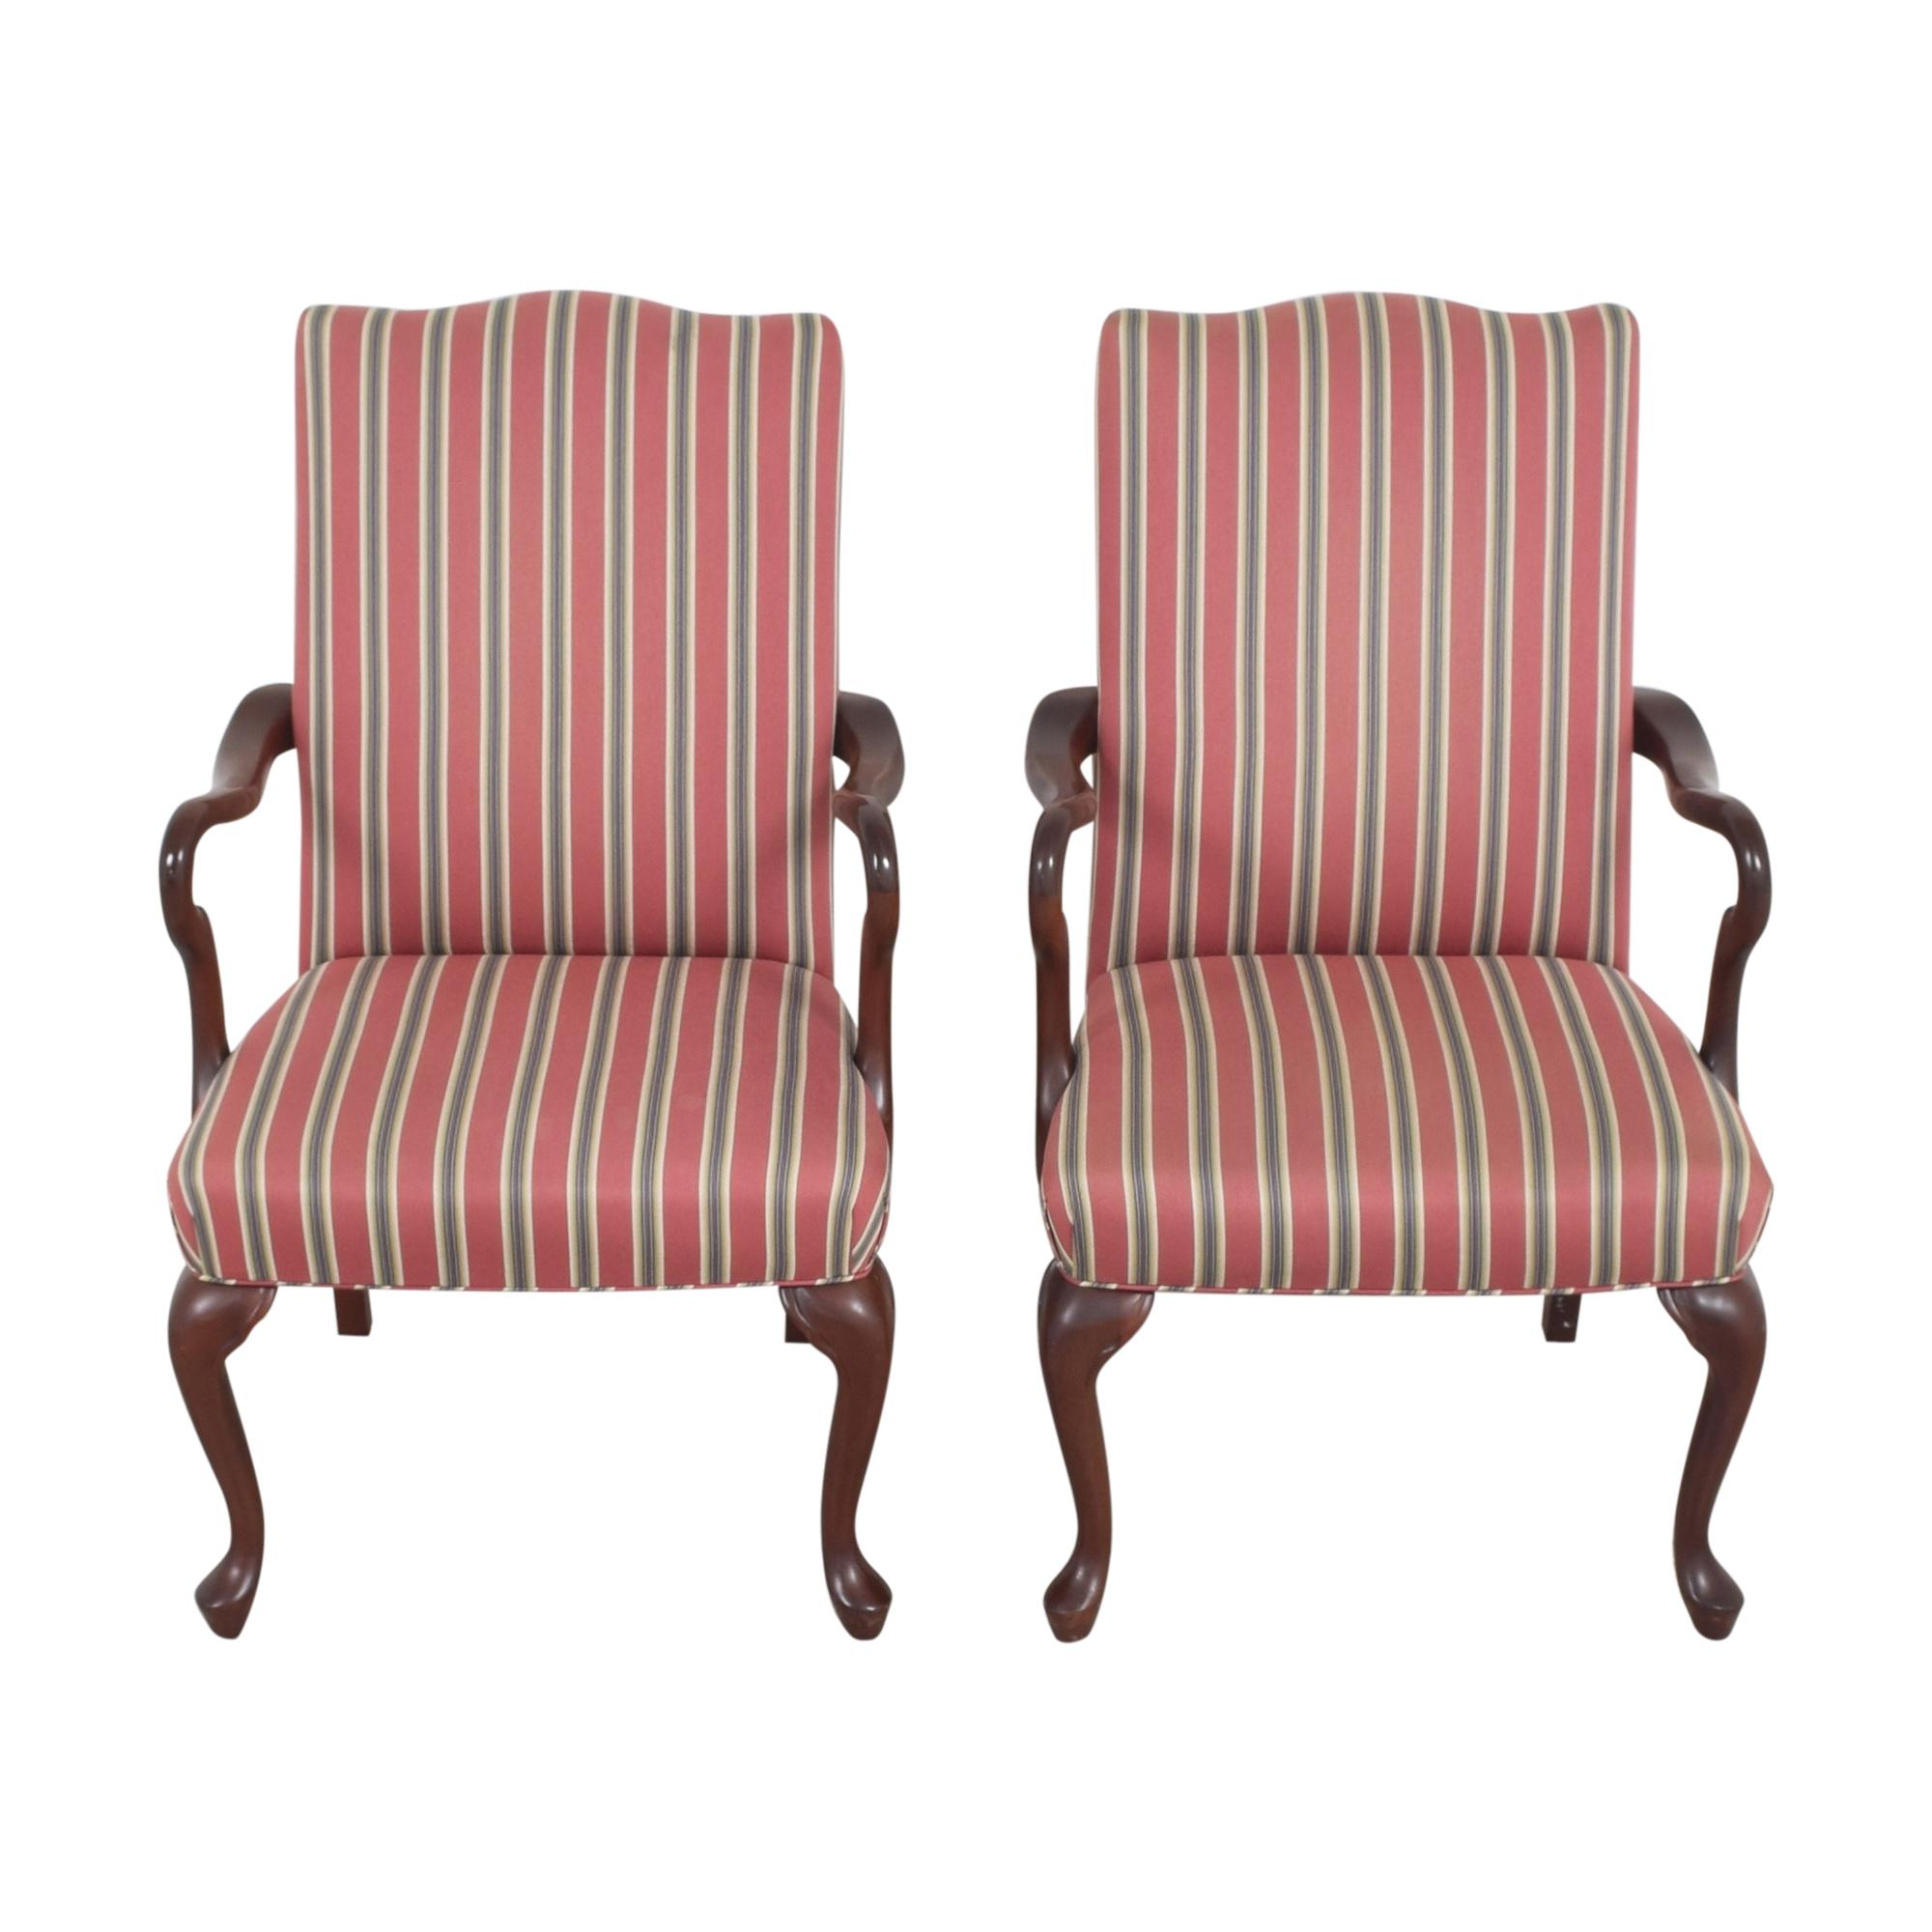 buy Haworth Stripe Dining Arm Chairs Haworth Dining Chairs